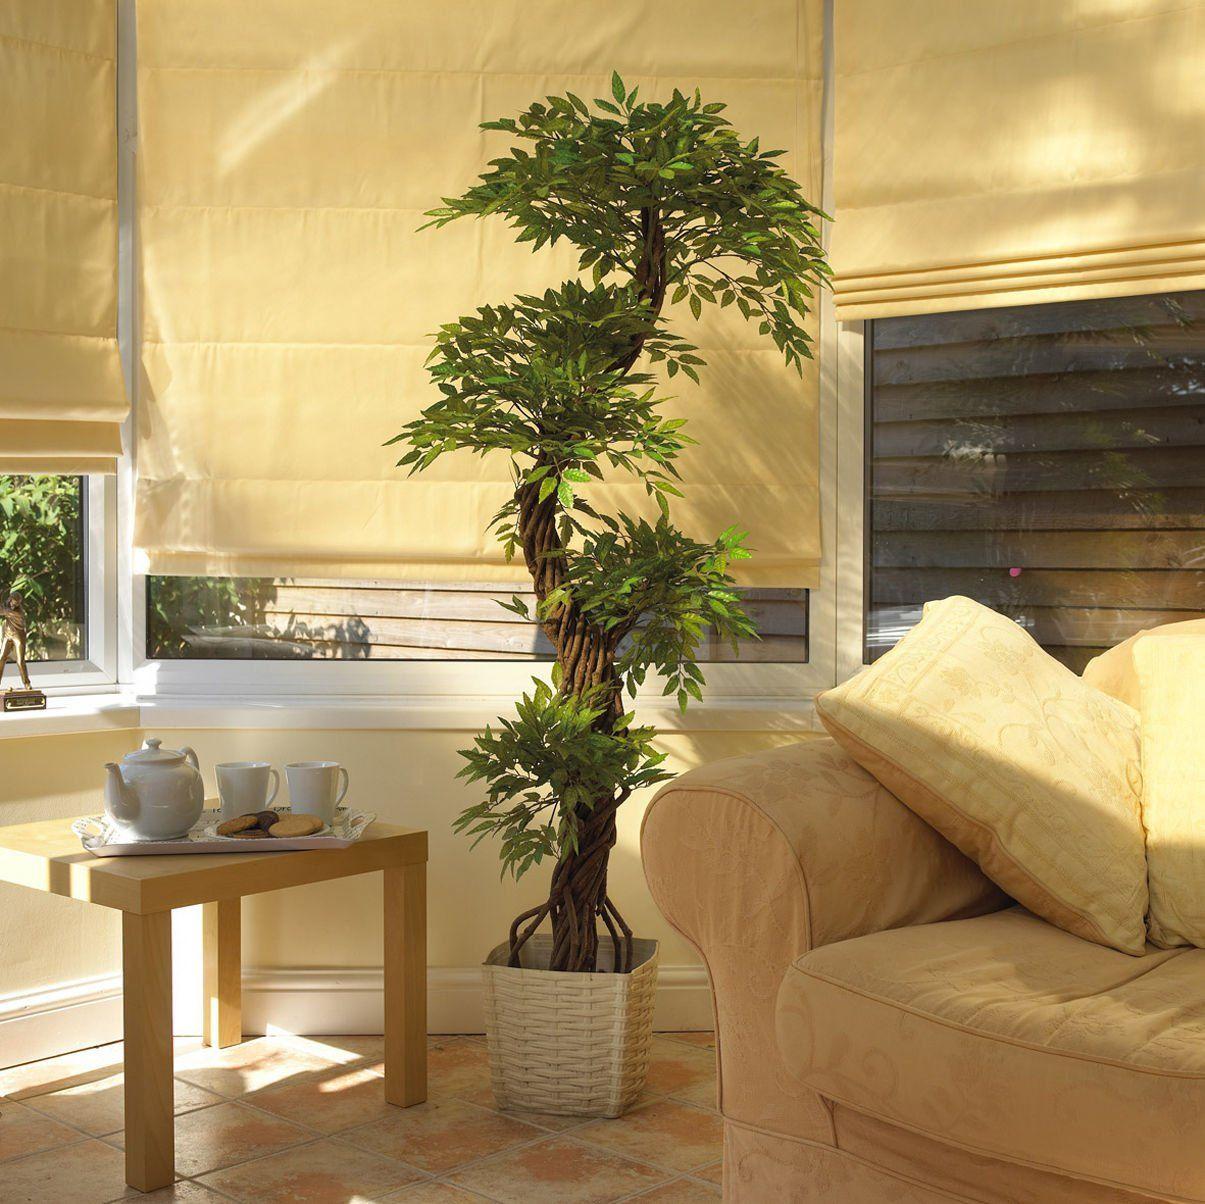 Elegante fruticosa japonesa artificial arbol lujosa for Arbol interior